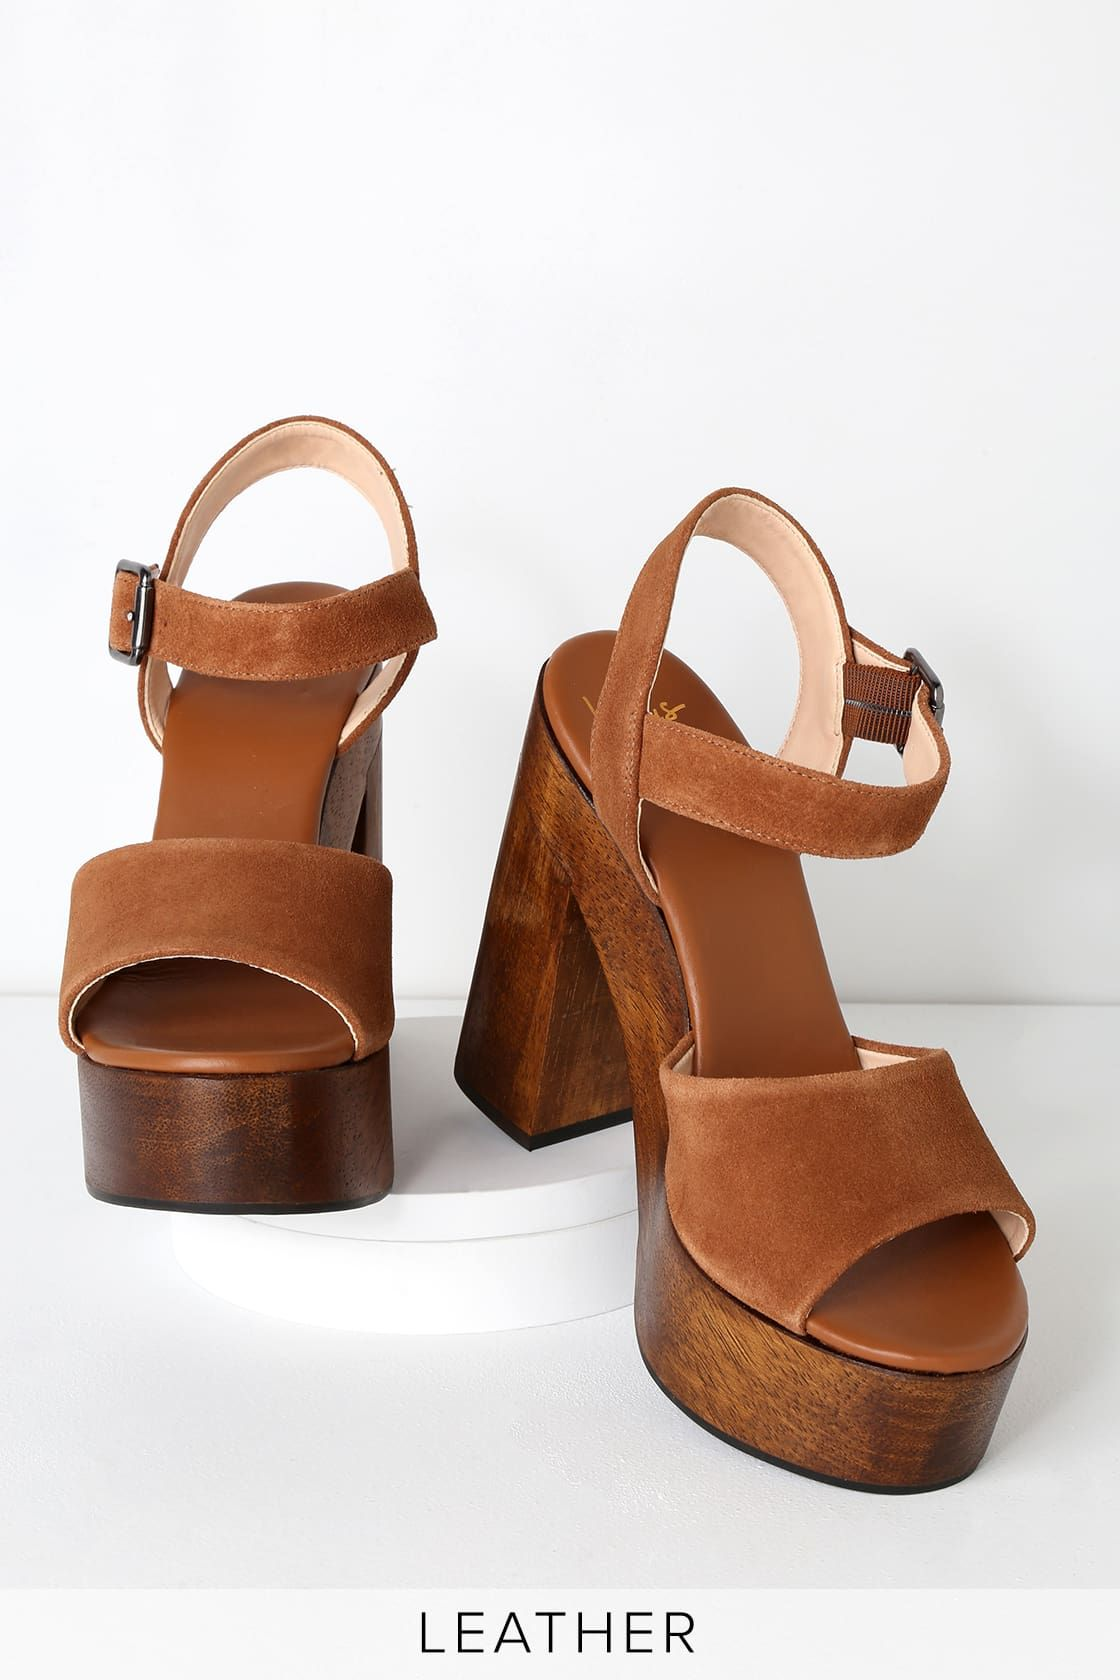 4936f18f63 Lulus | Lolita Leather Cognac Suede Wooden Platform Sandal Heels ...